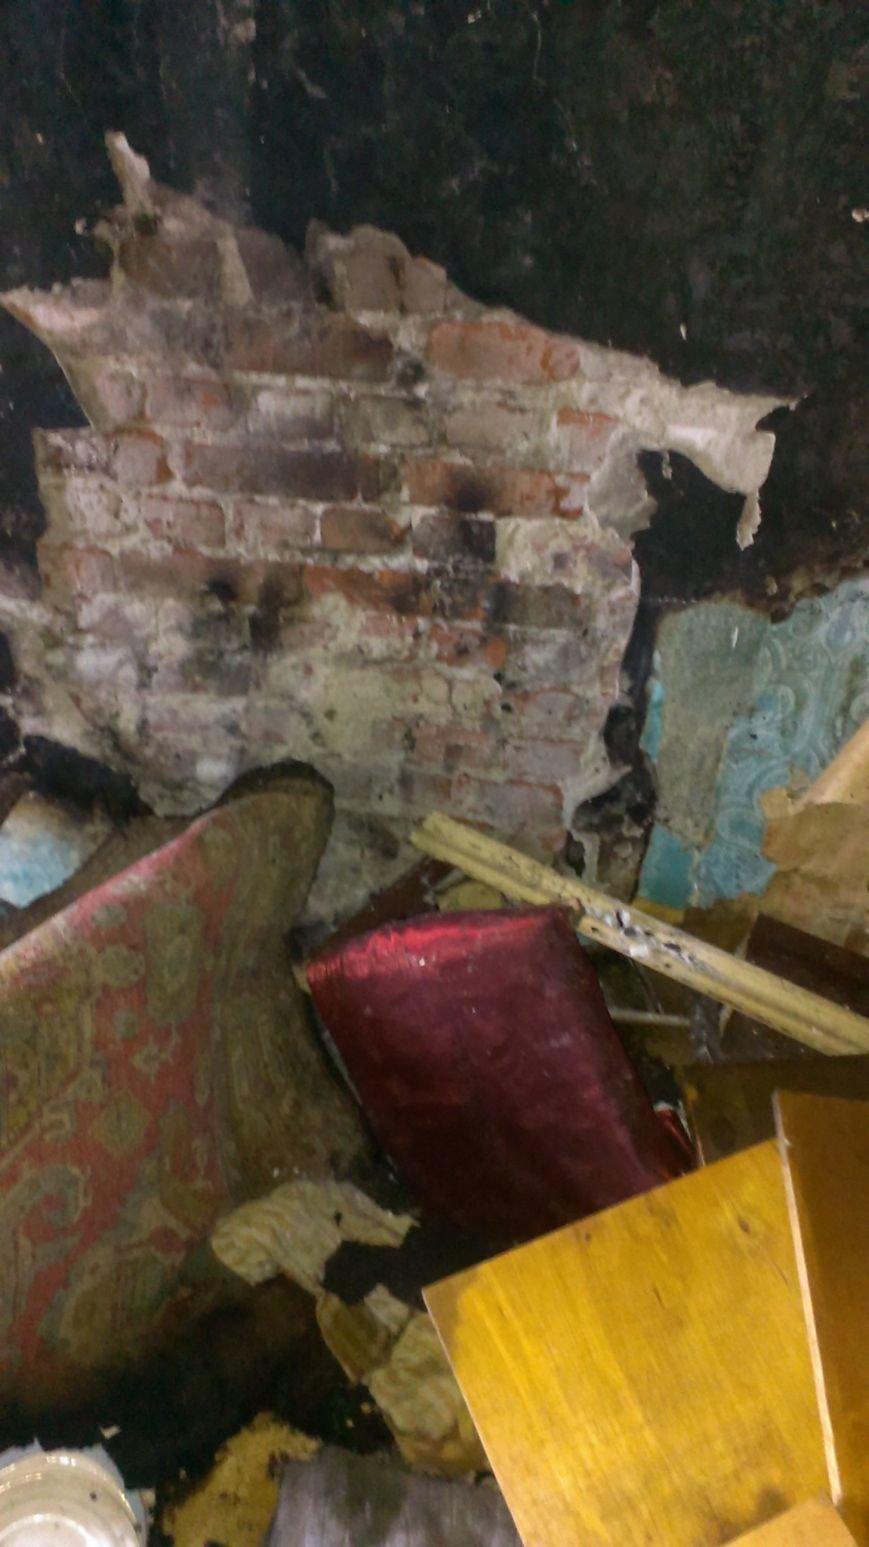 В Днепродзержинске 1 января 2 человека пострадало на пожаре (фото) - фото 3